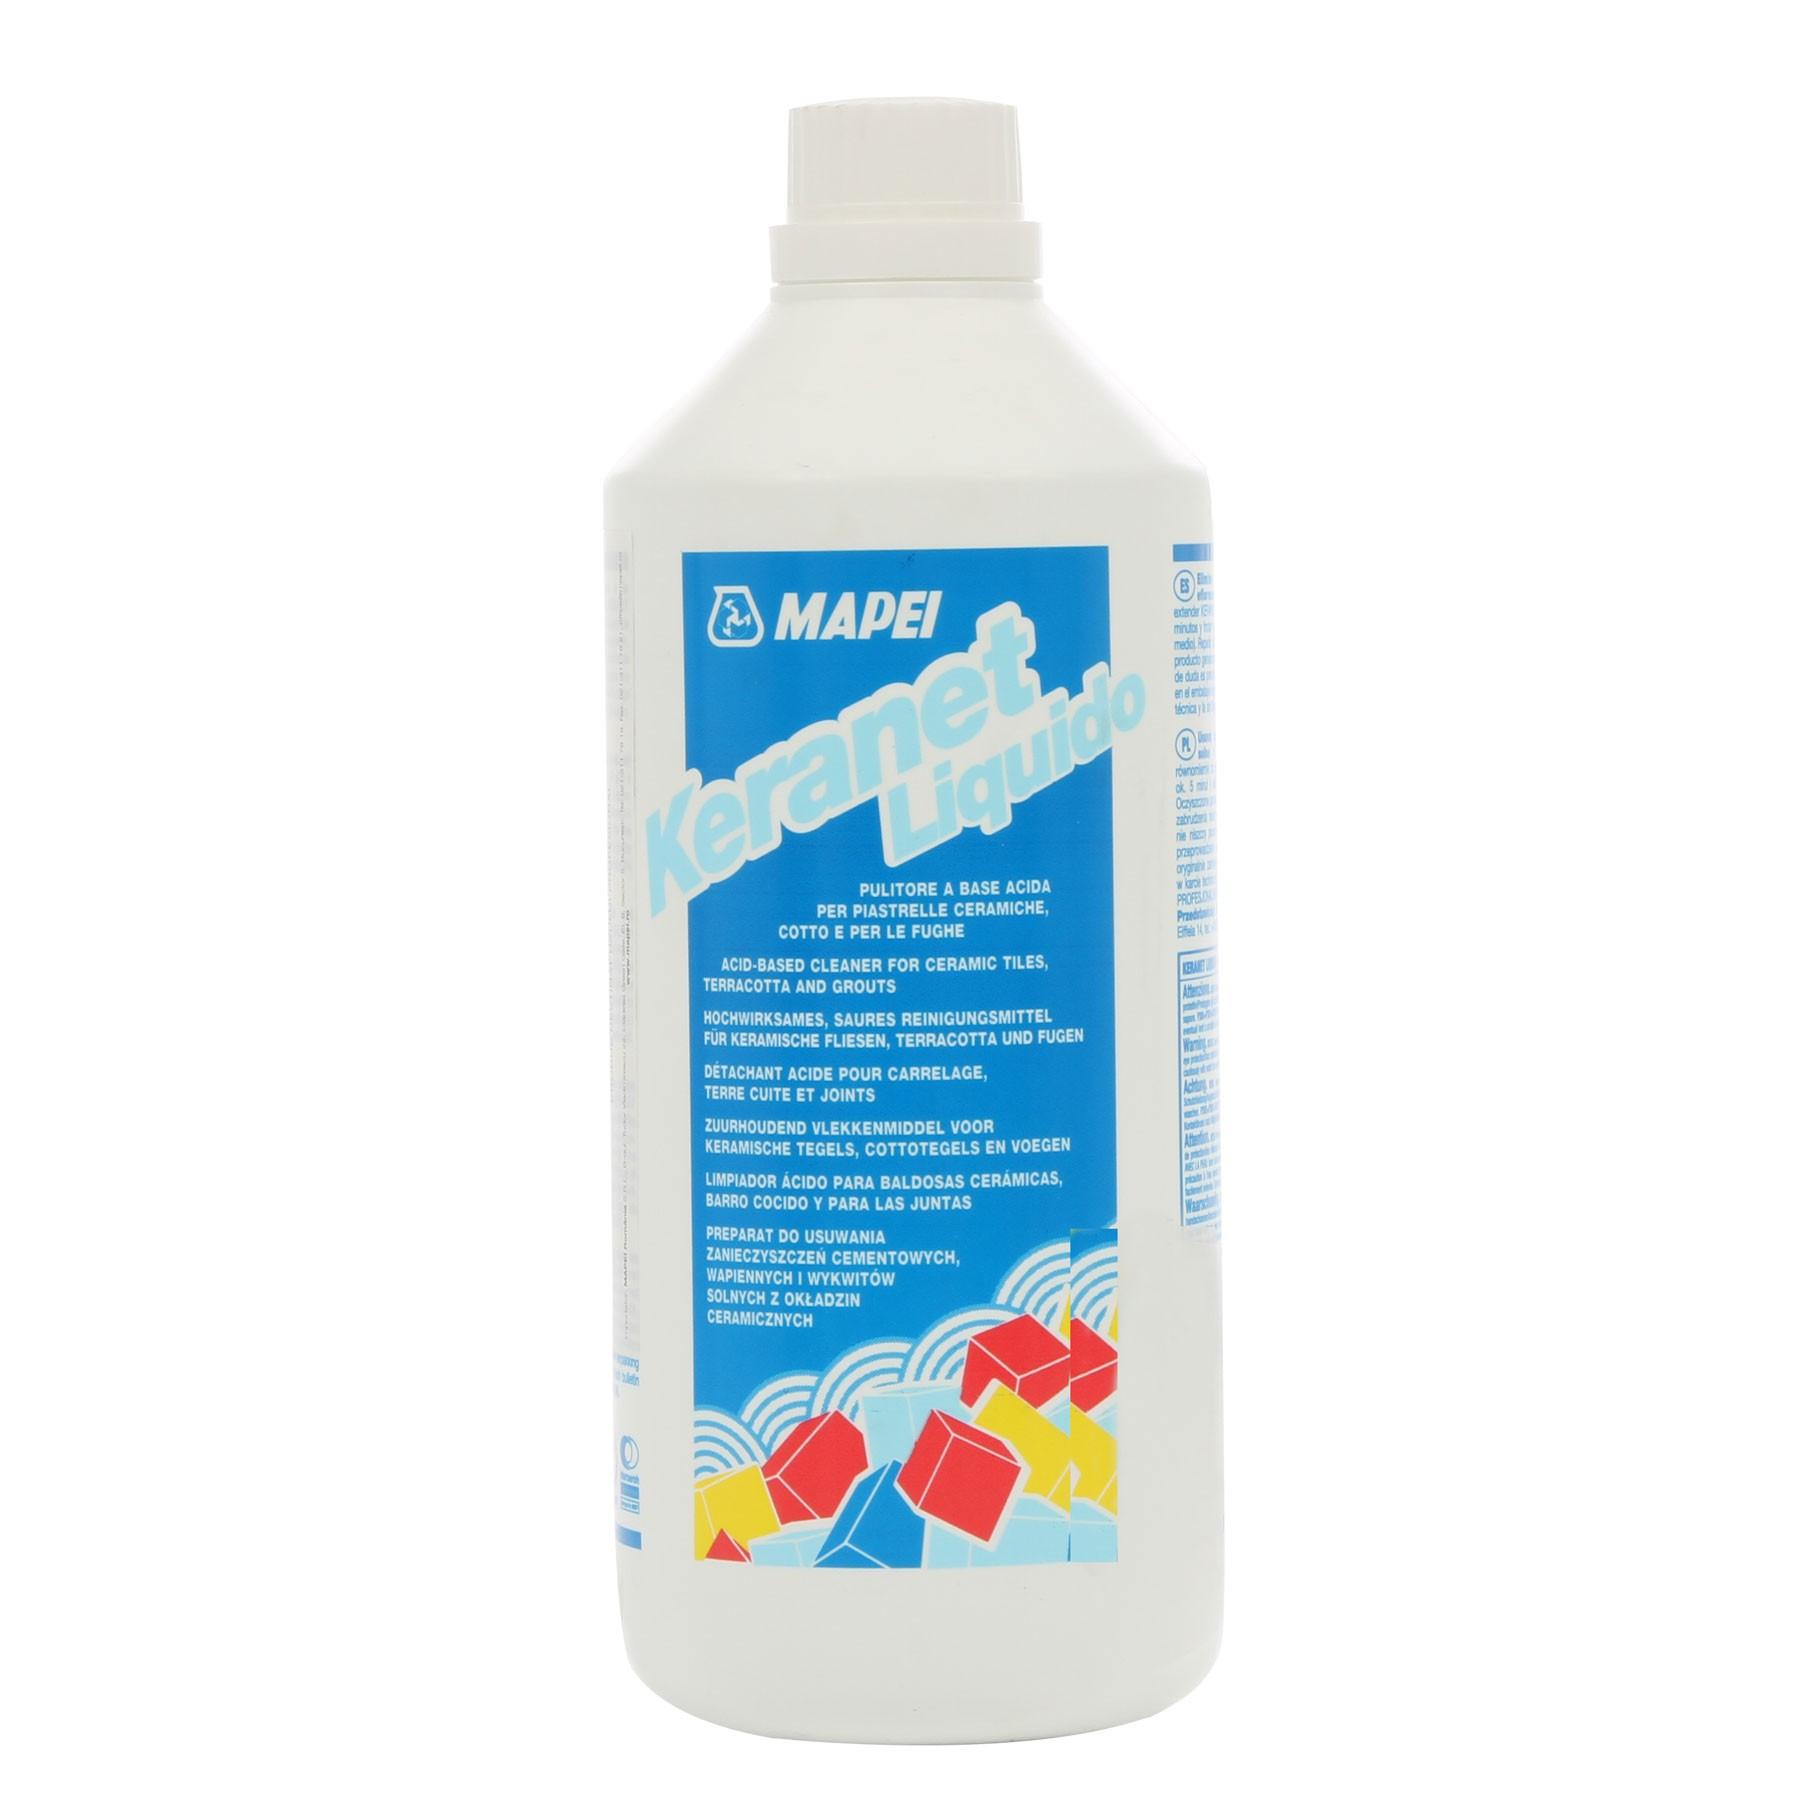 Keranet Come Si Usa.Detergent Pentru Curatarea Murdarii Pe Baza De Ciment Keranet Liquido 1l